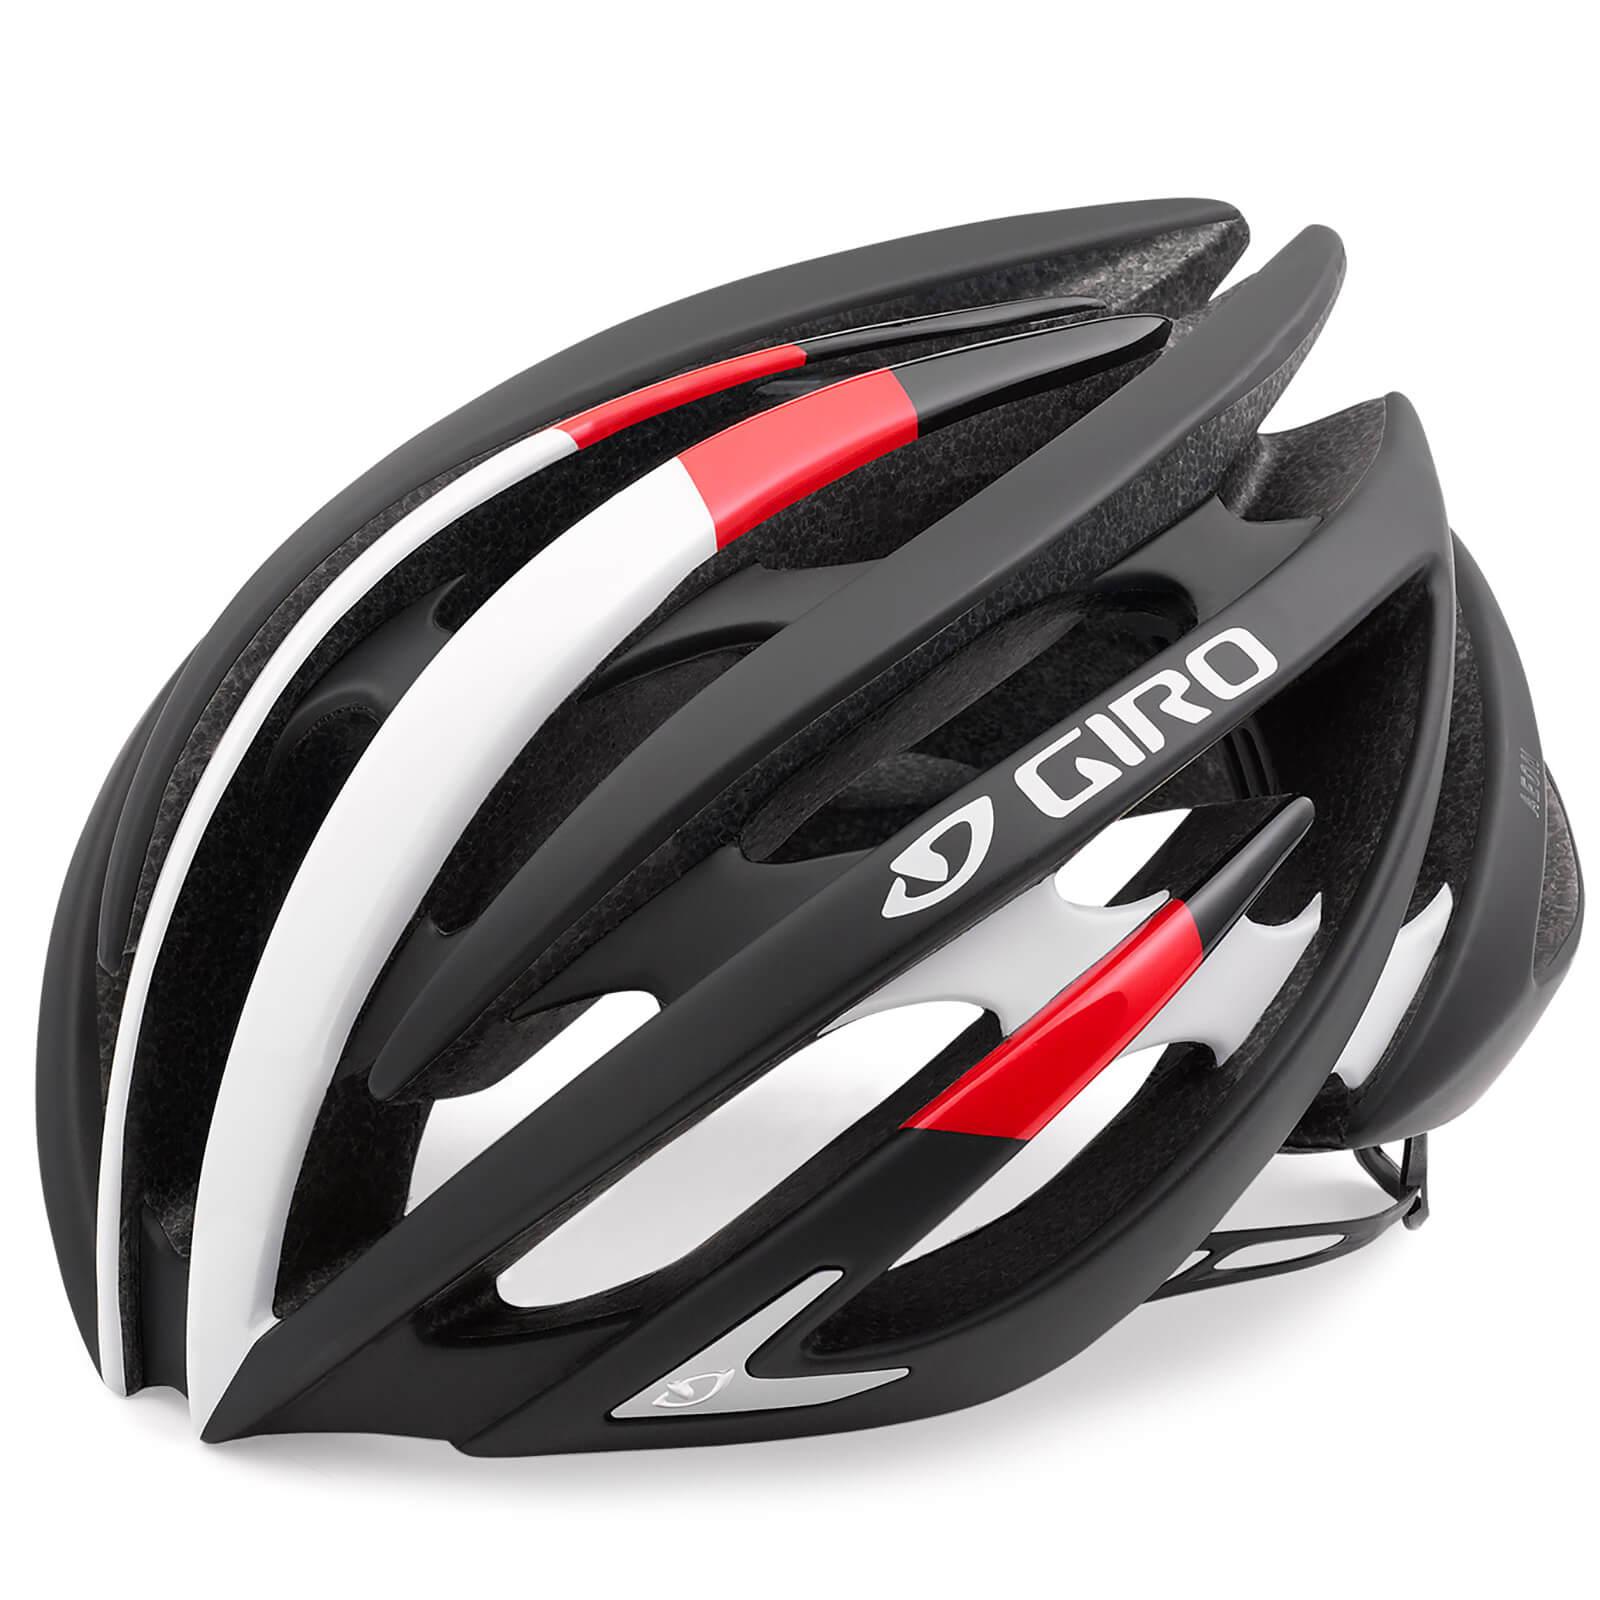 Giro Aeon Road Helmet - 2019 - S/51-55cm - Matt Black/Bright Red